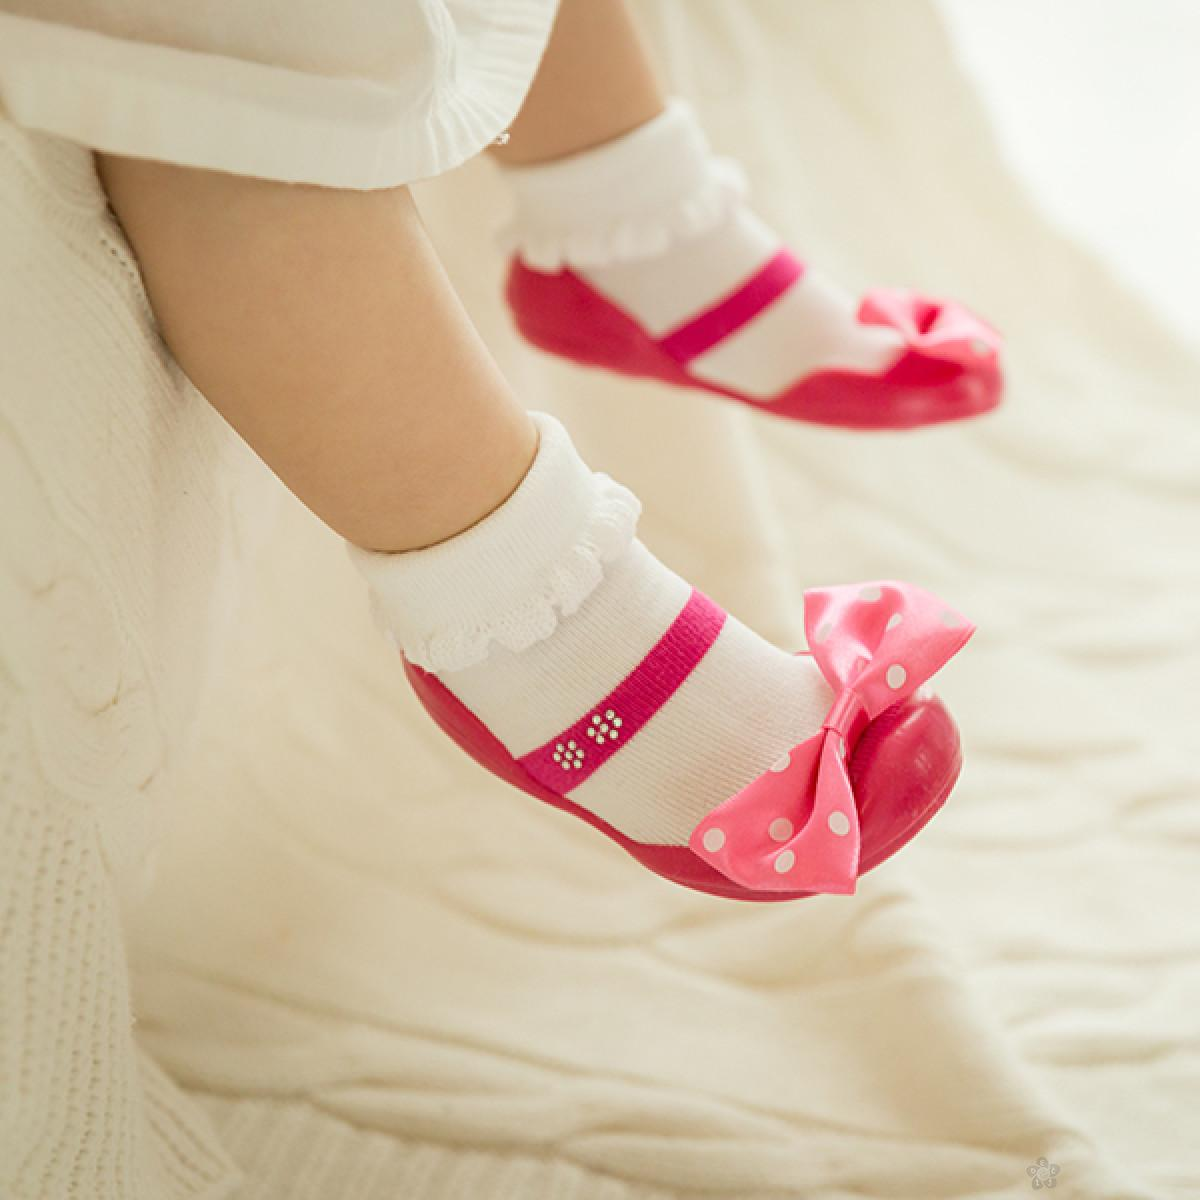 Cipelice za decu Ggomoosin Elishia Pink